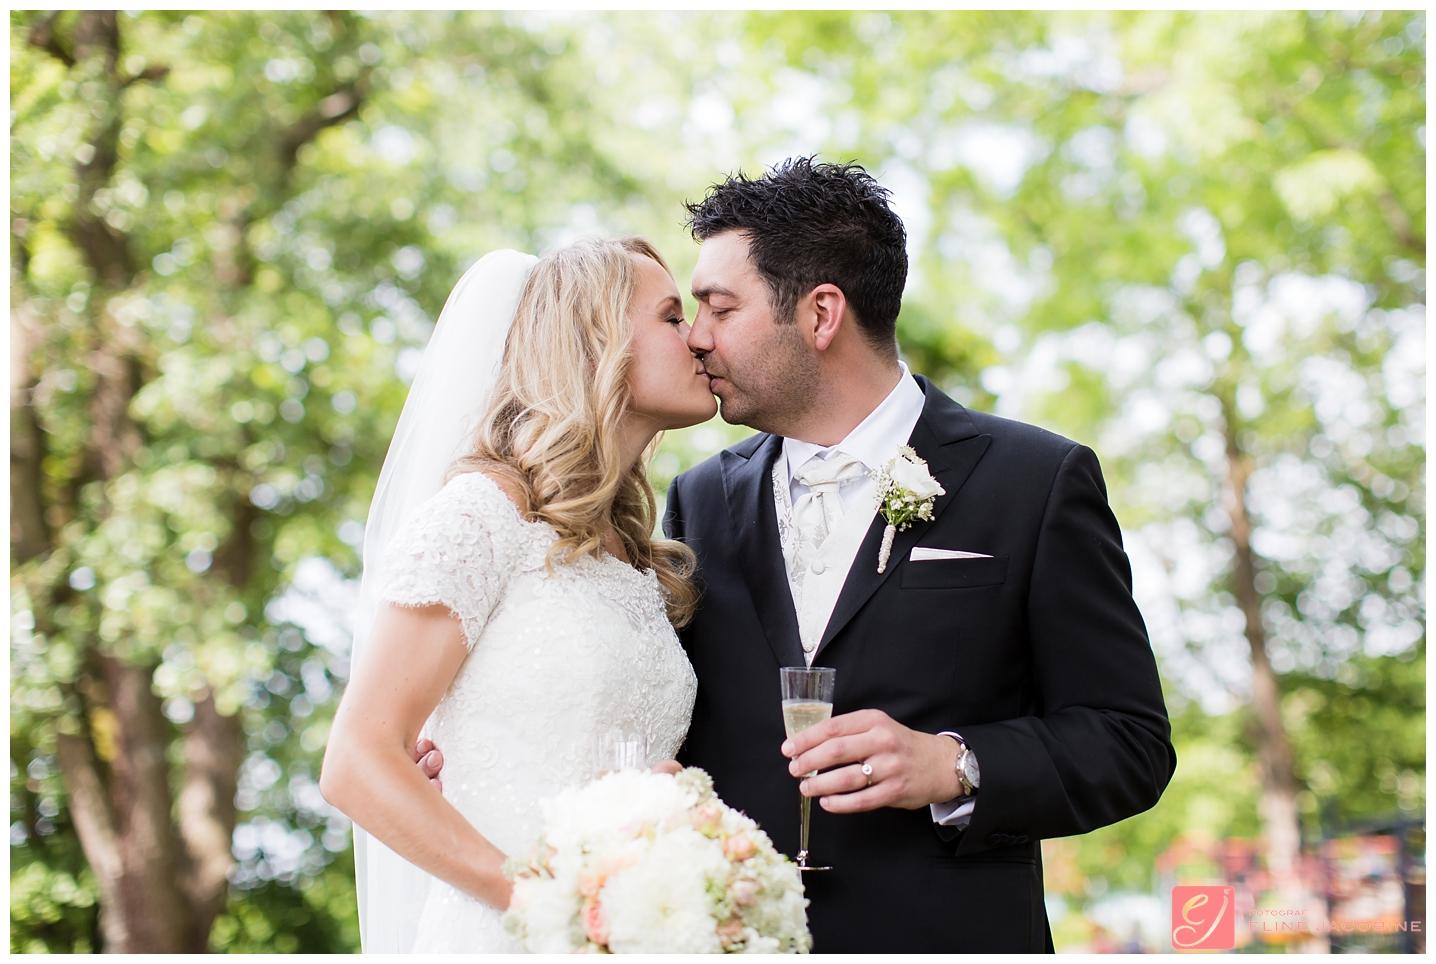 Bryllup-Drøbak-Villa-Malla-bilder